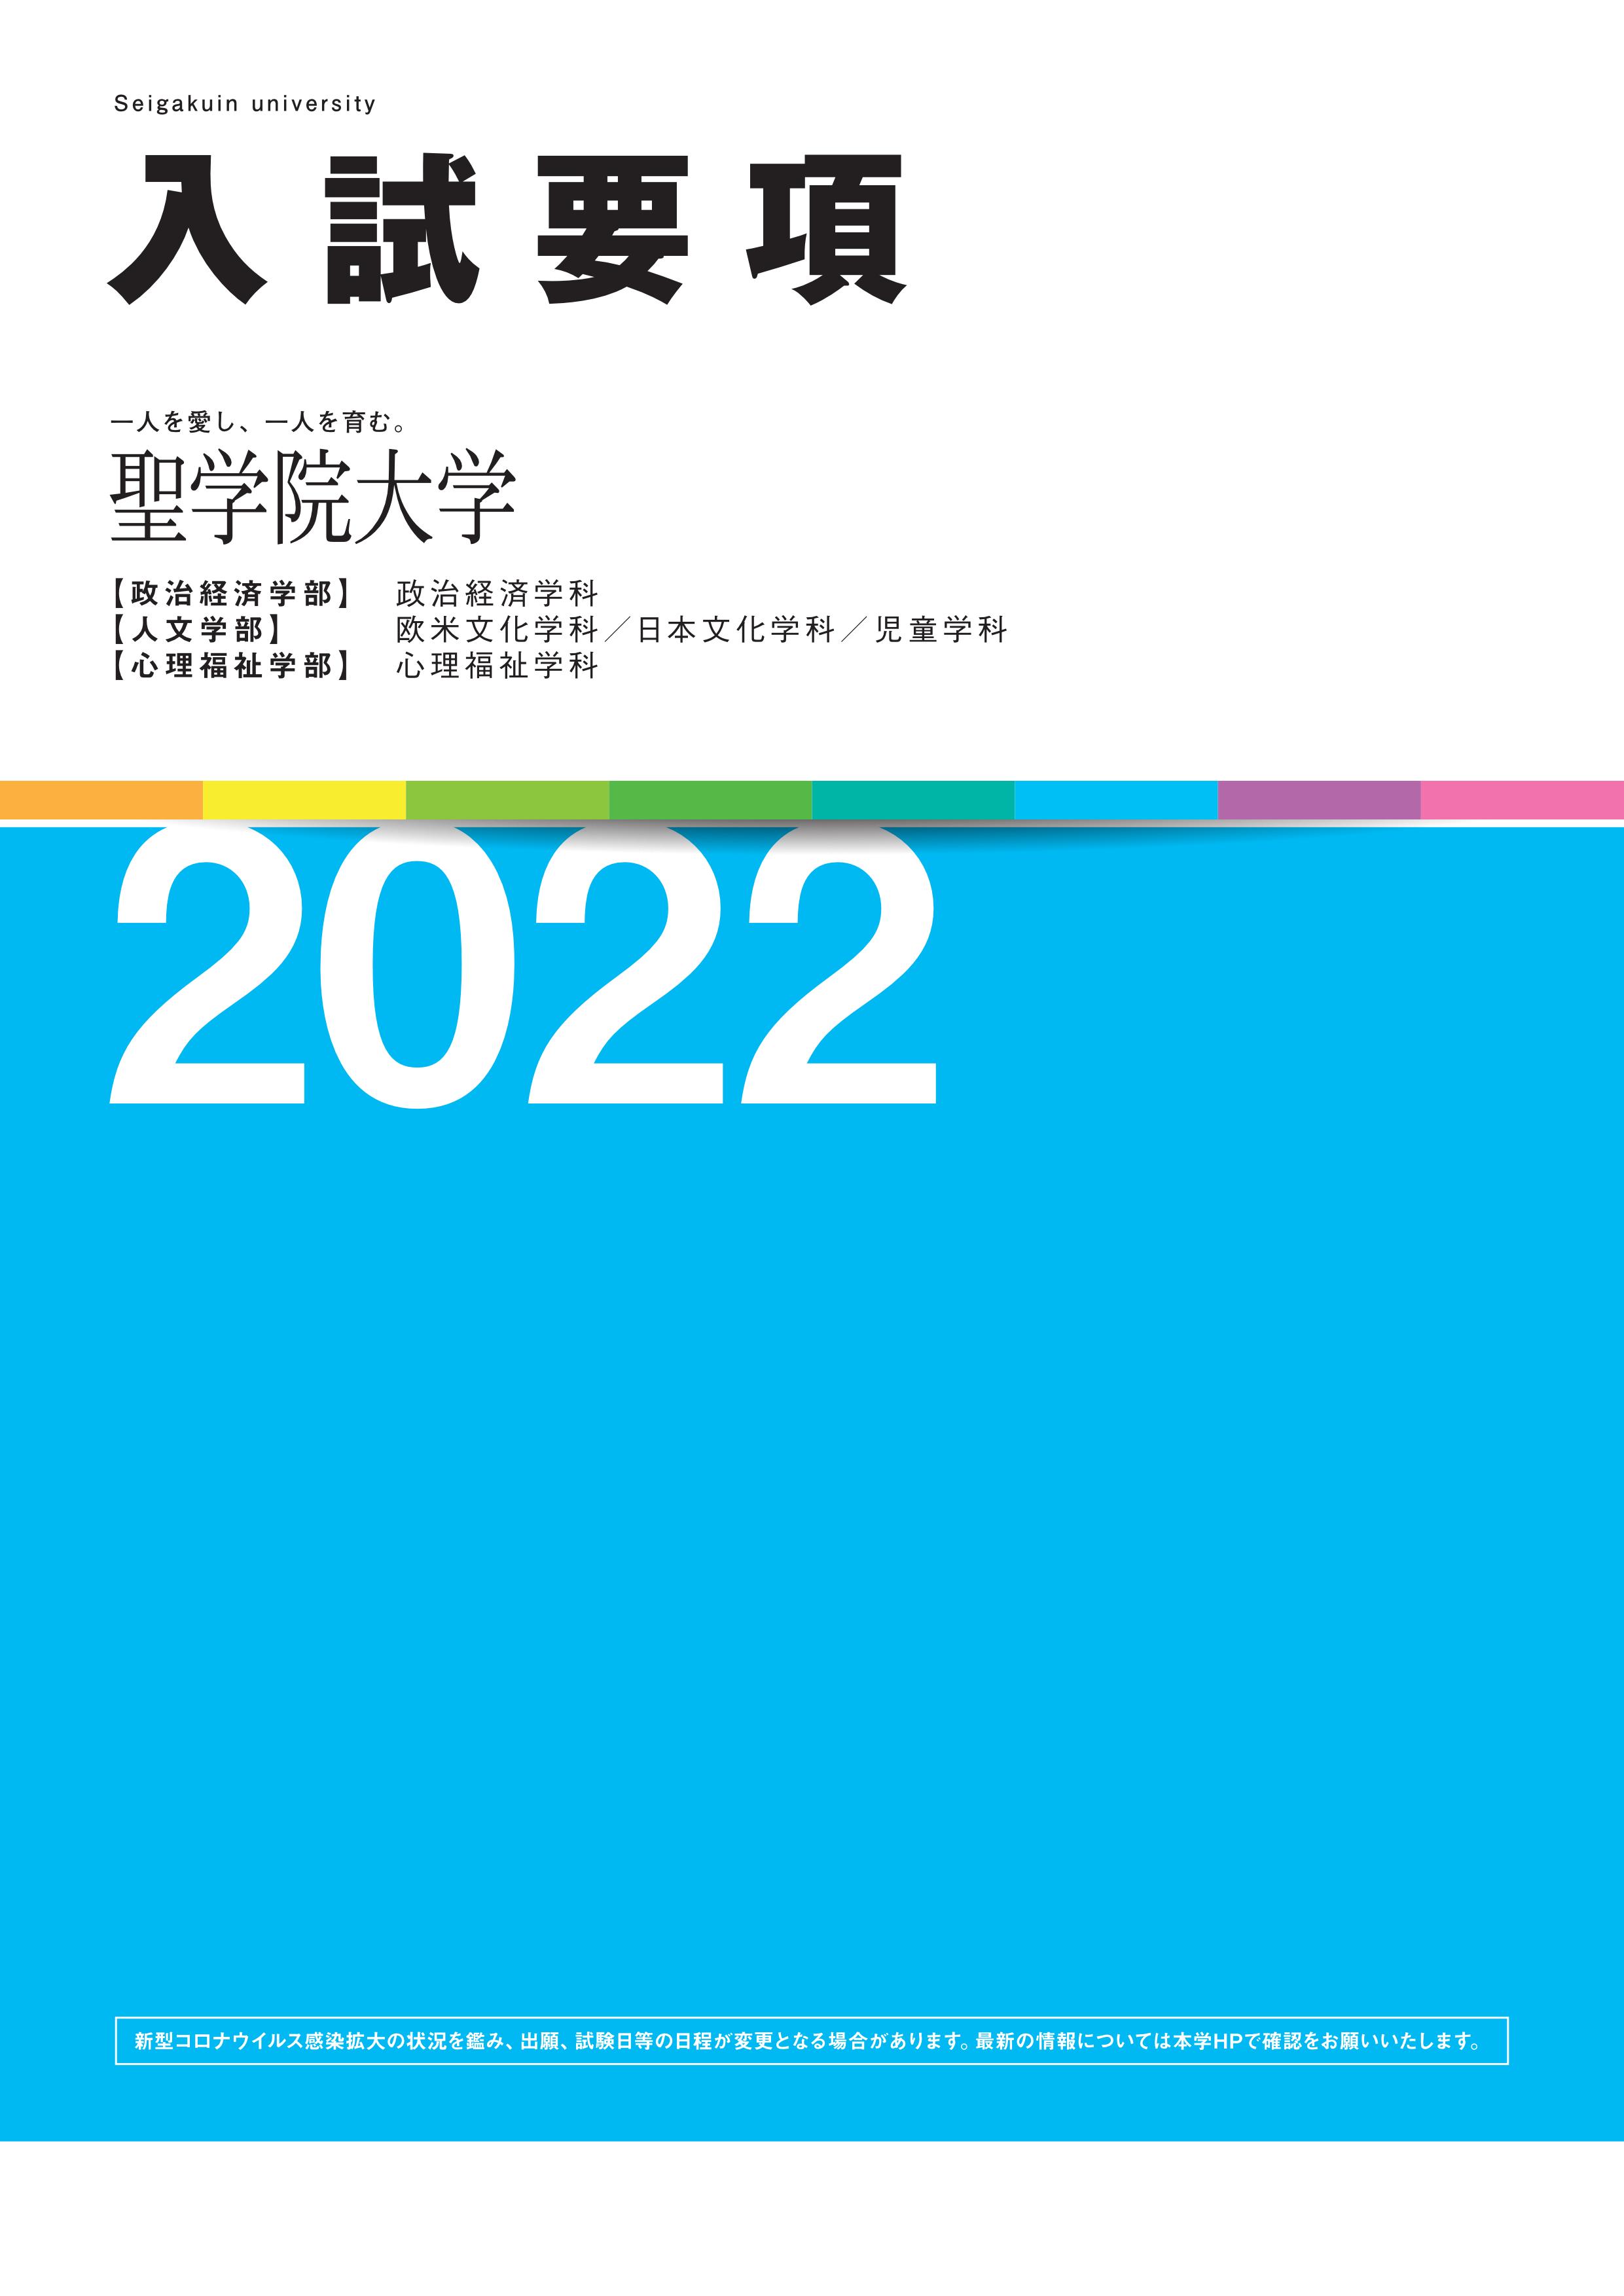 2022NyushiYoukou.png